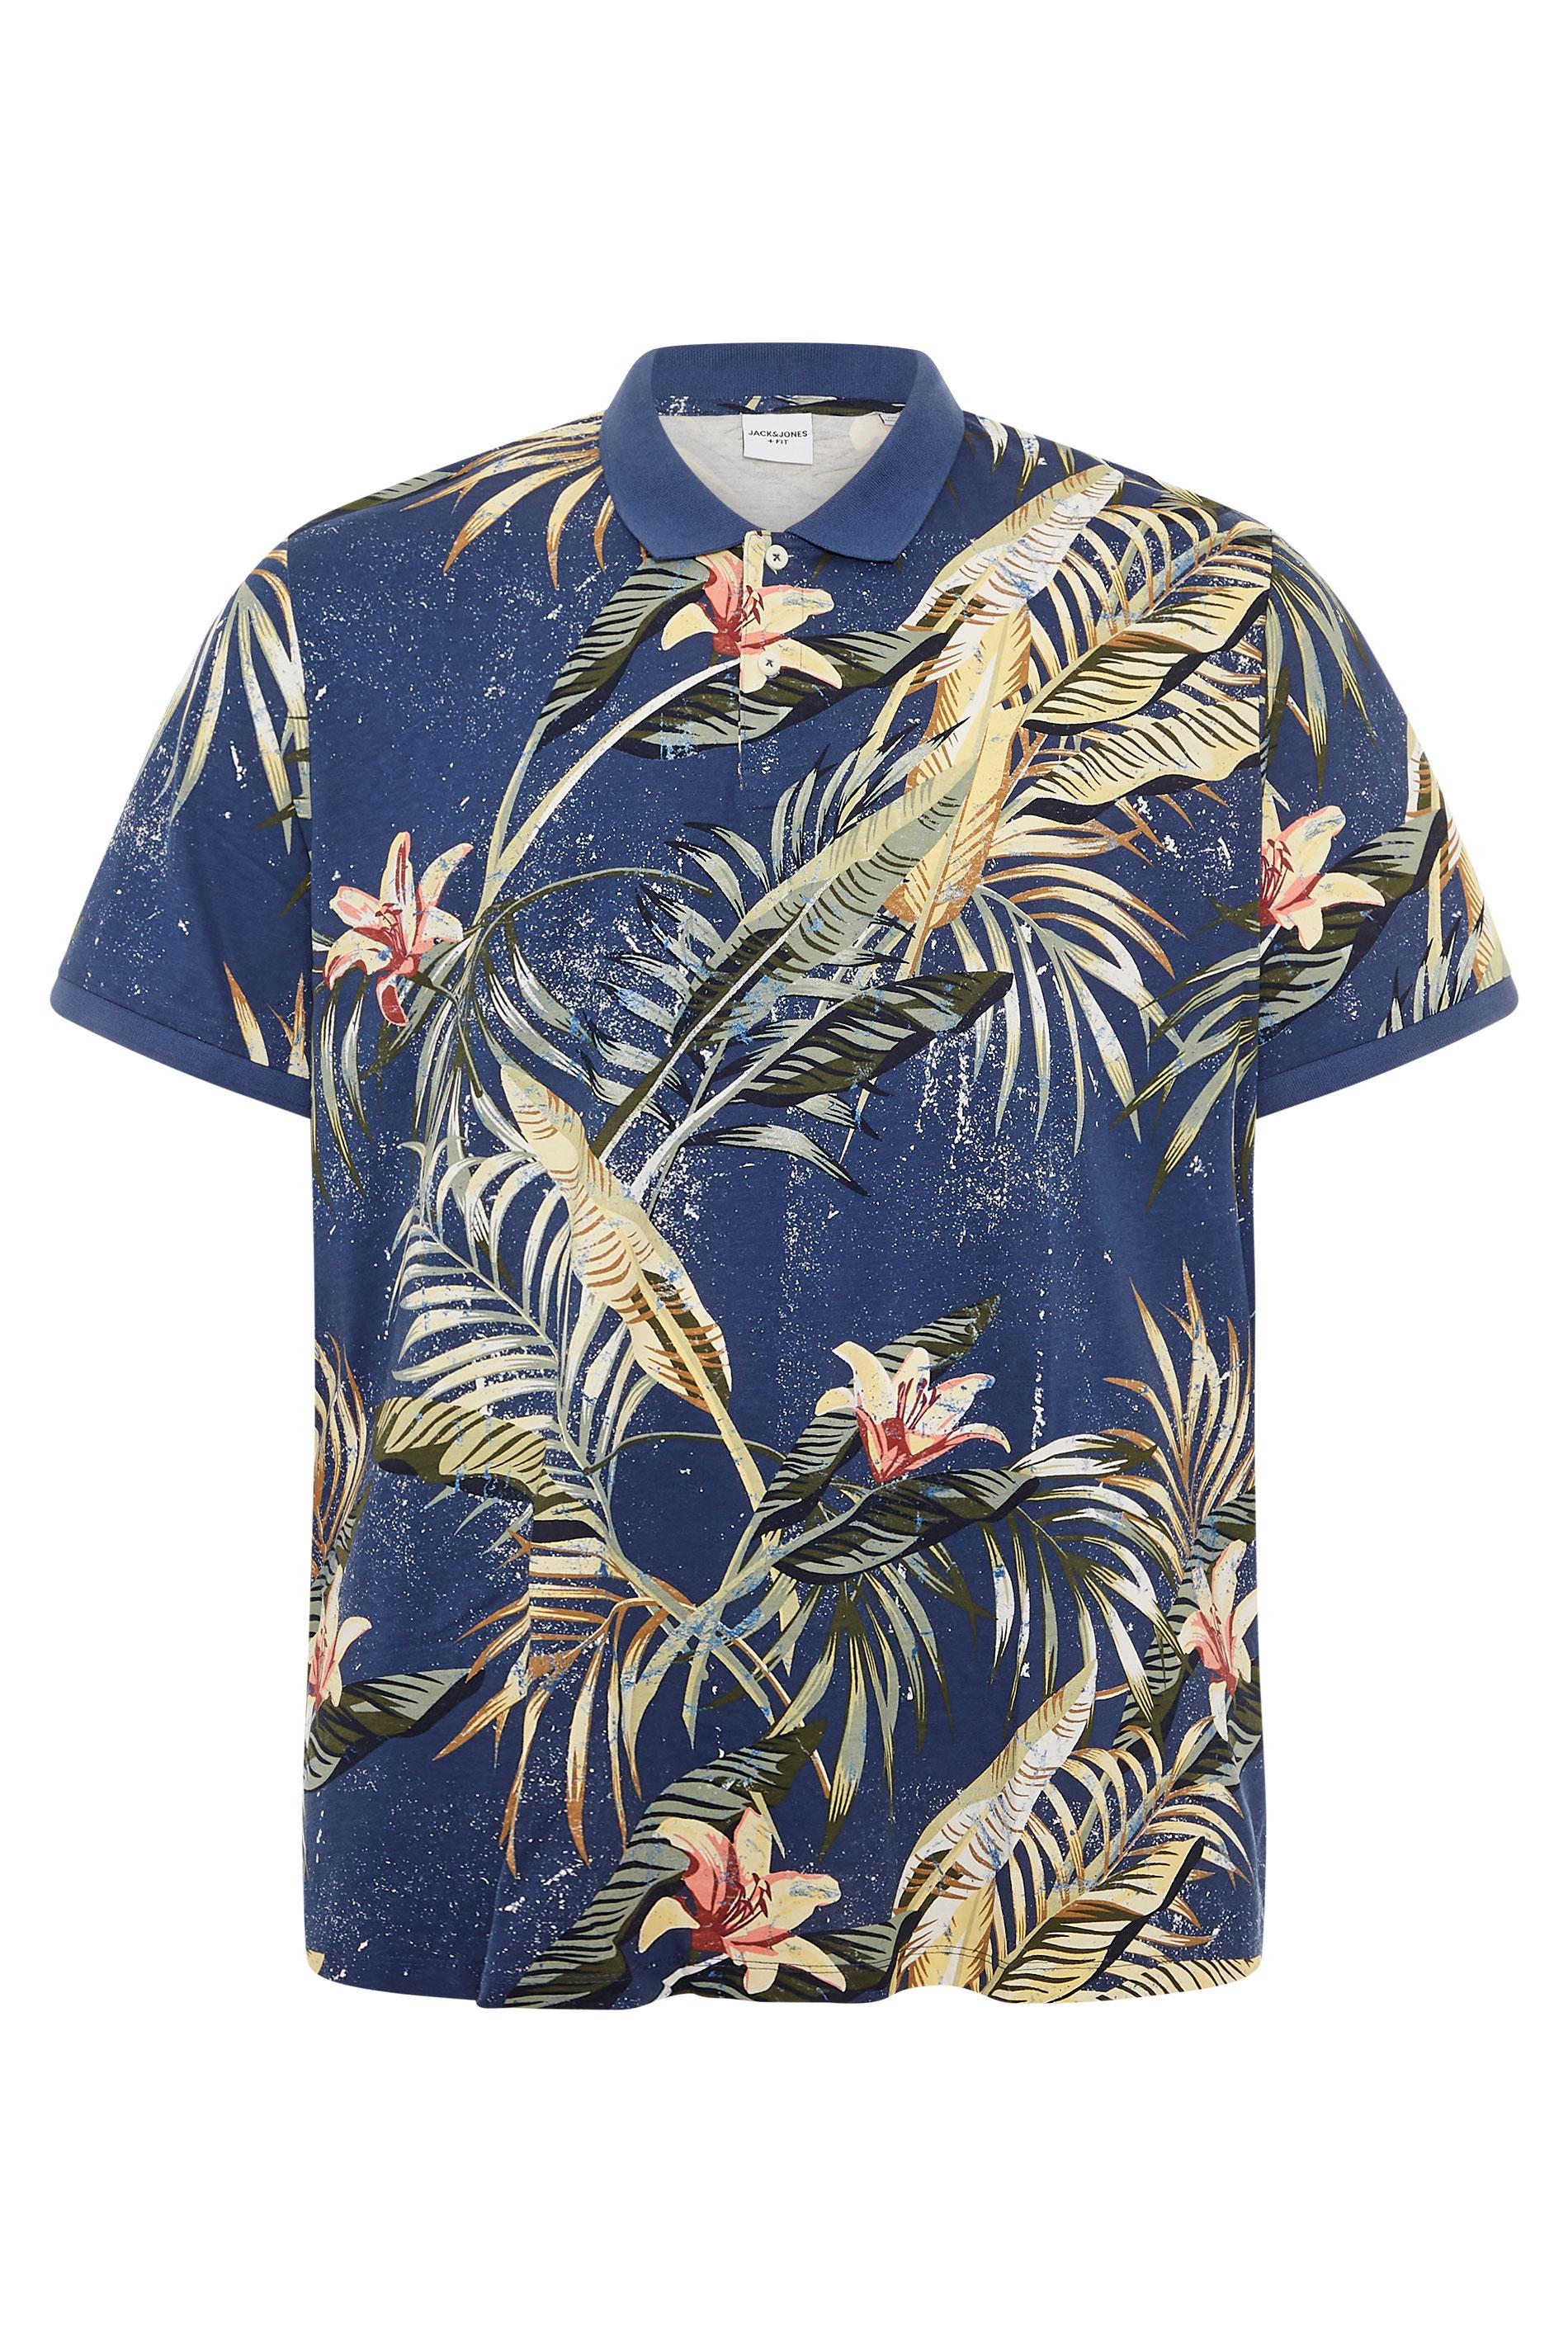 JACK & JONES Navy Tropical Print Polo Shirt